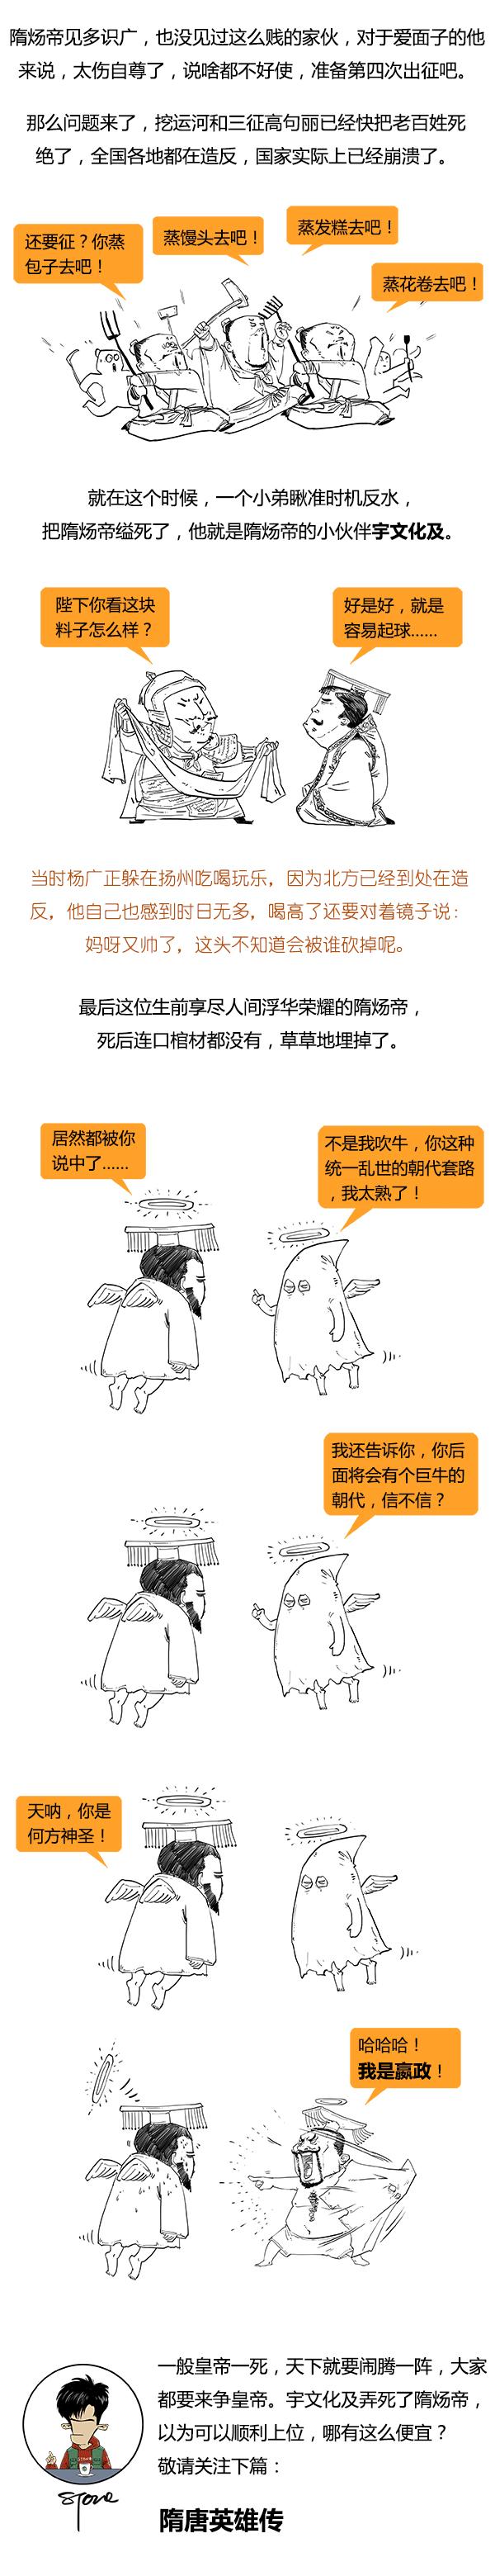 Stone历史剧-隋_07.png